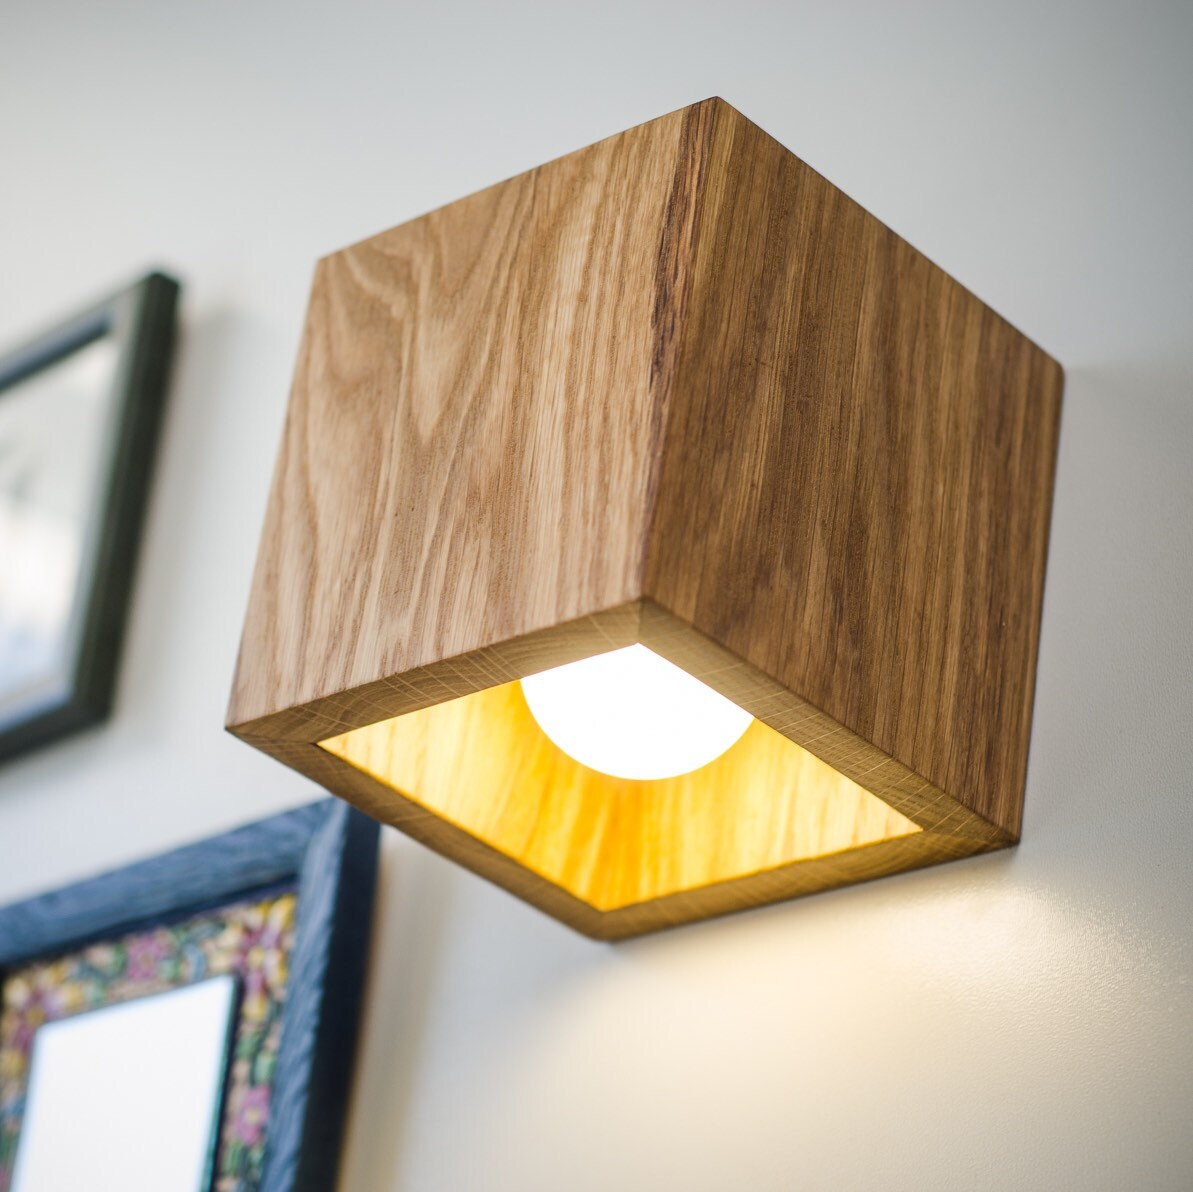 wall lamp wooden Q#163 handmade. wall light. sconce. wood lamp. wooden  lamp. minimalist light. natural. dark brown bog oak wall lamp.